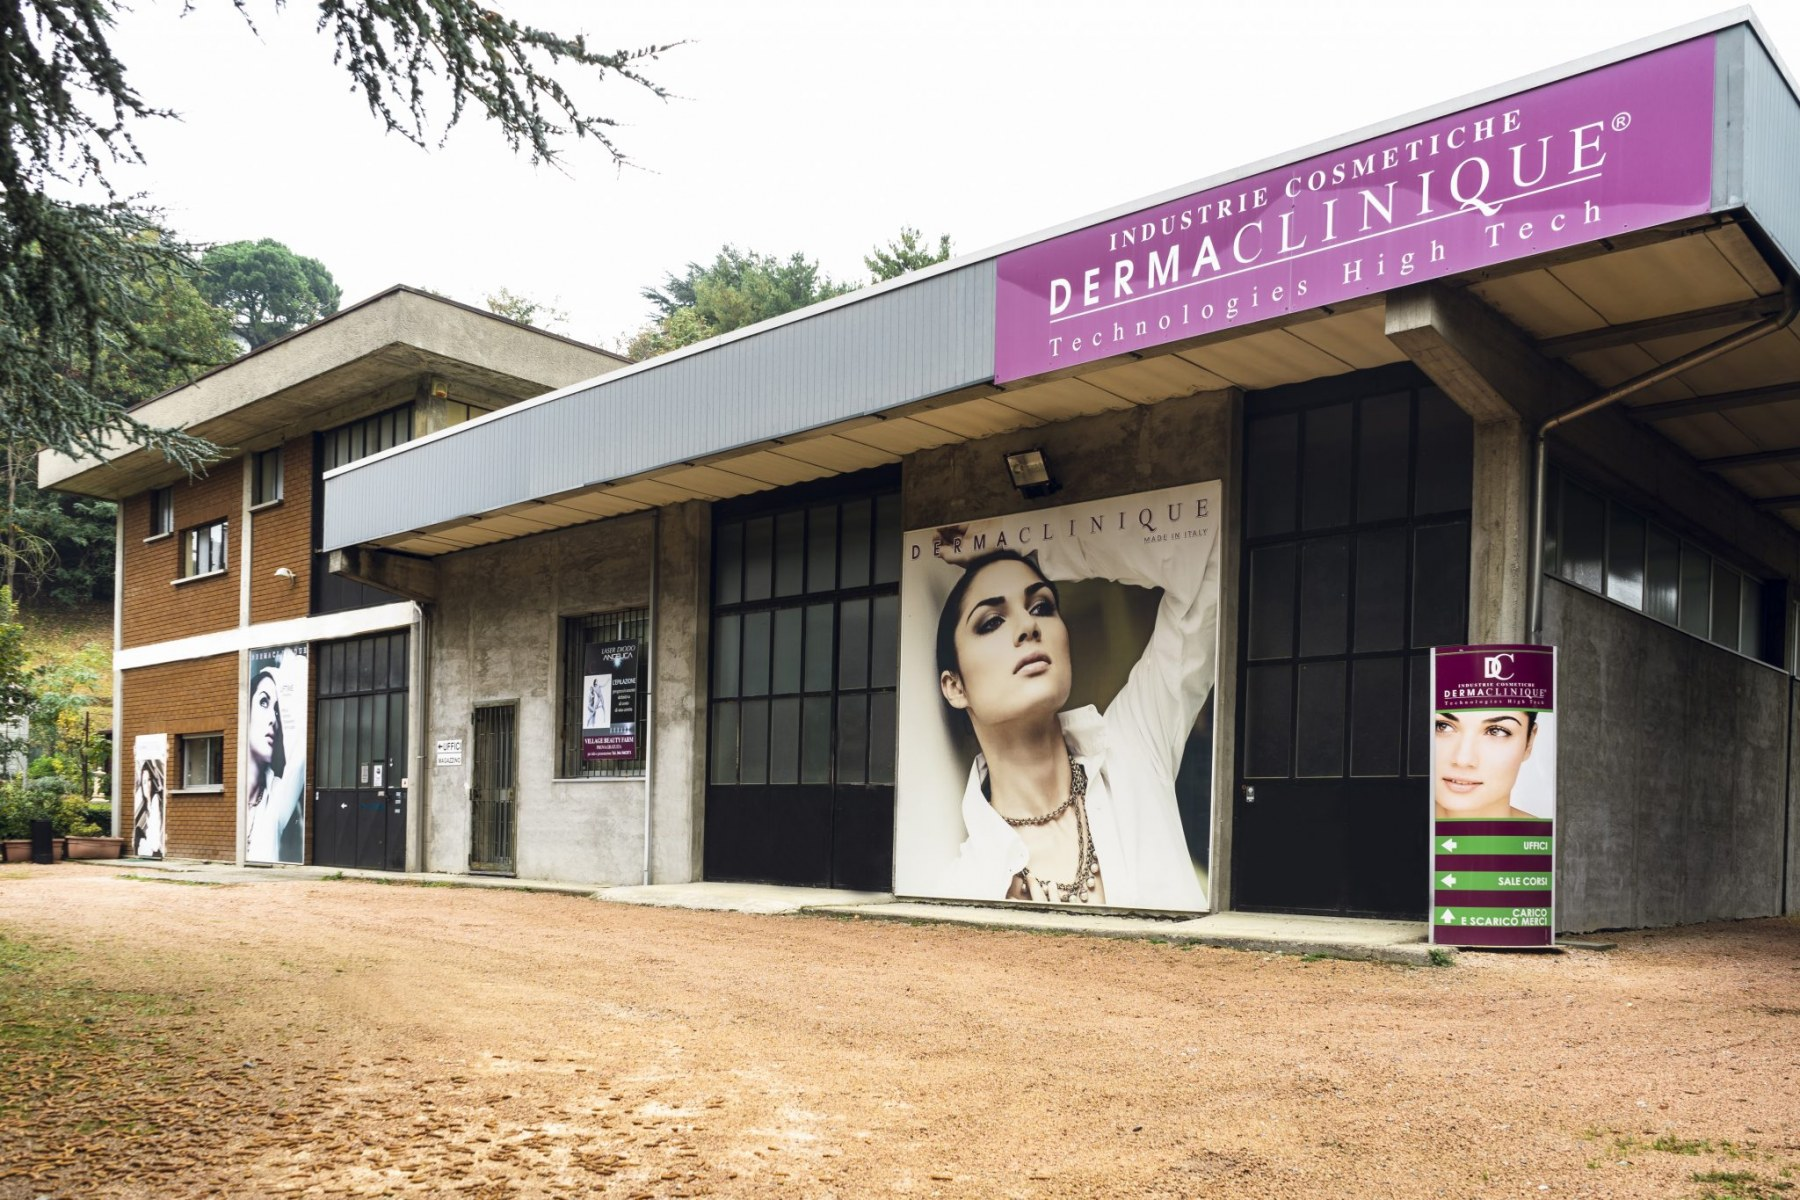 Azienda Dermaclinique